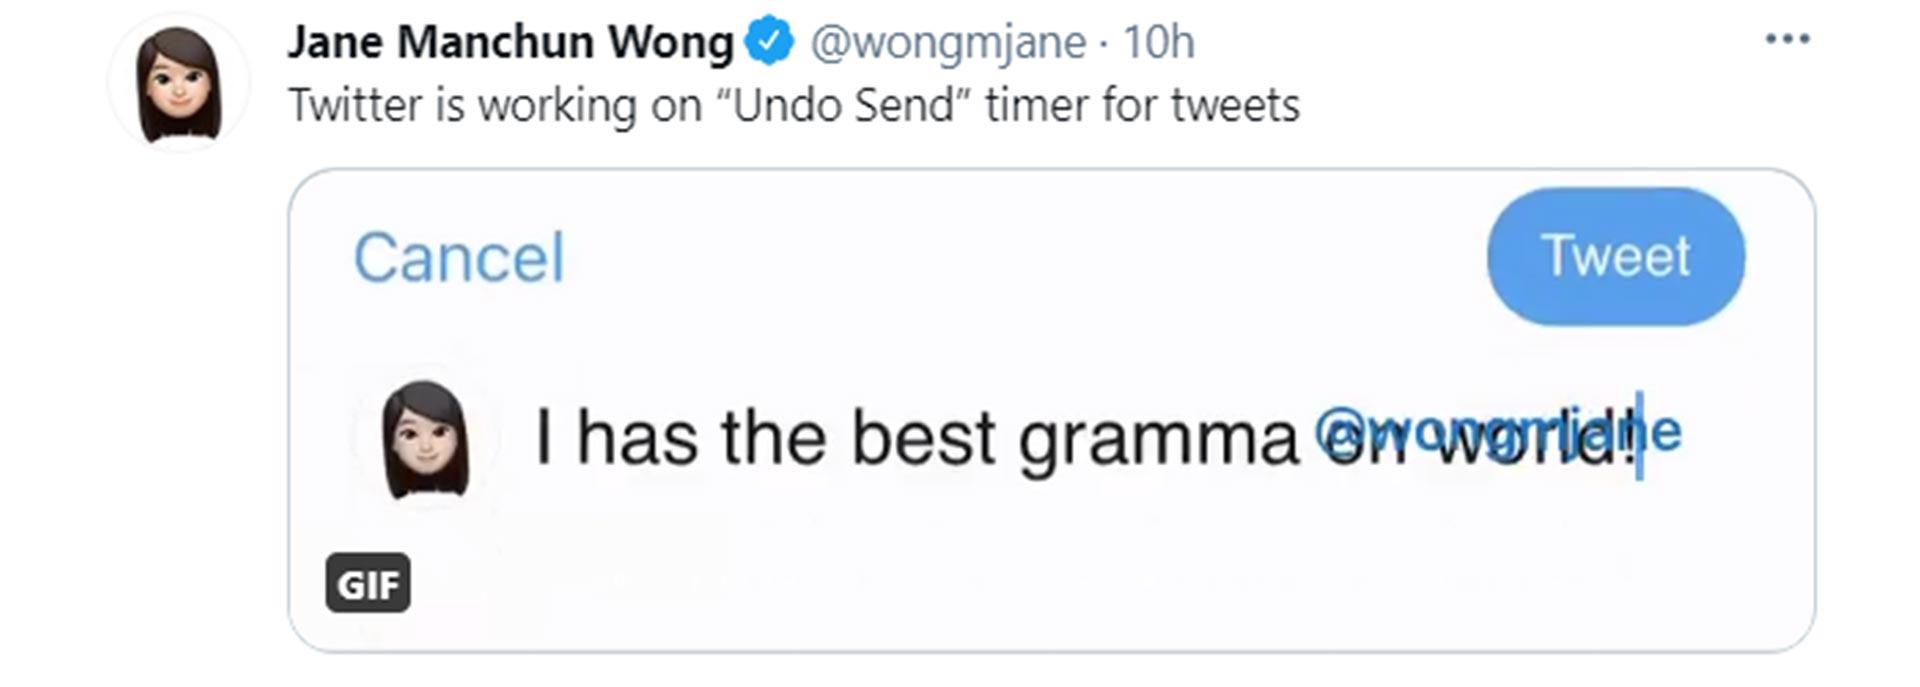 Twitter: @wongmjane